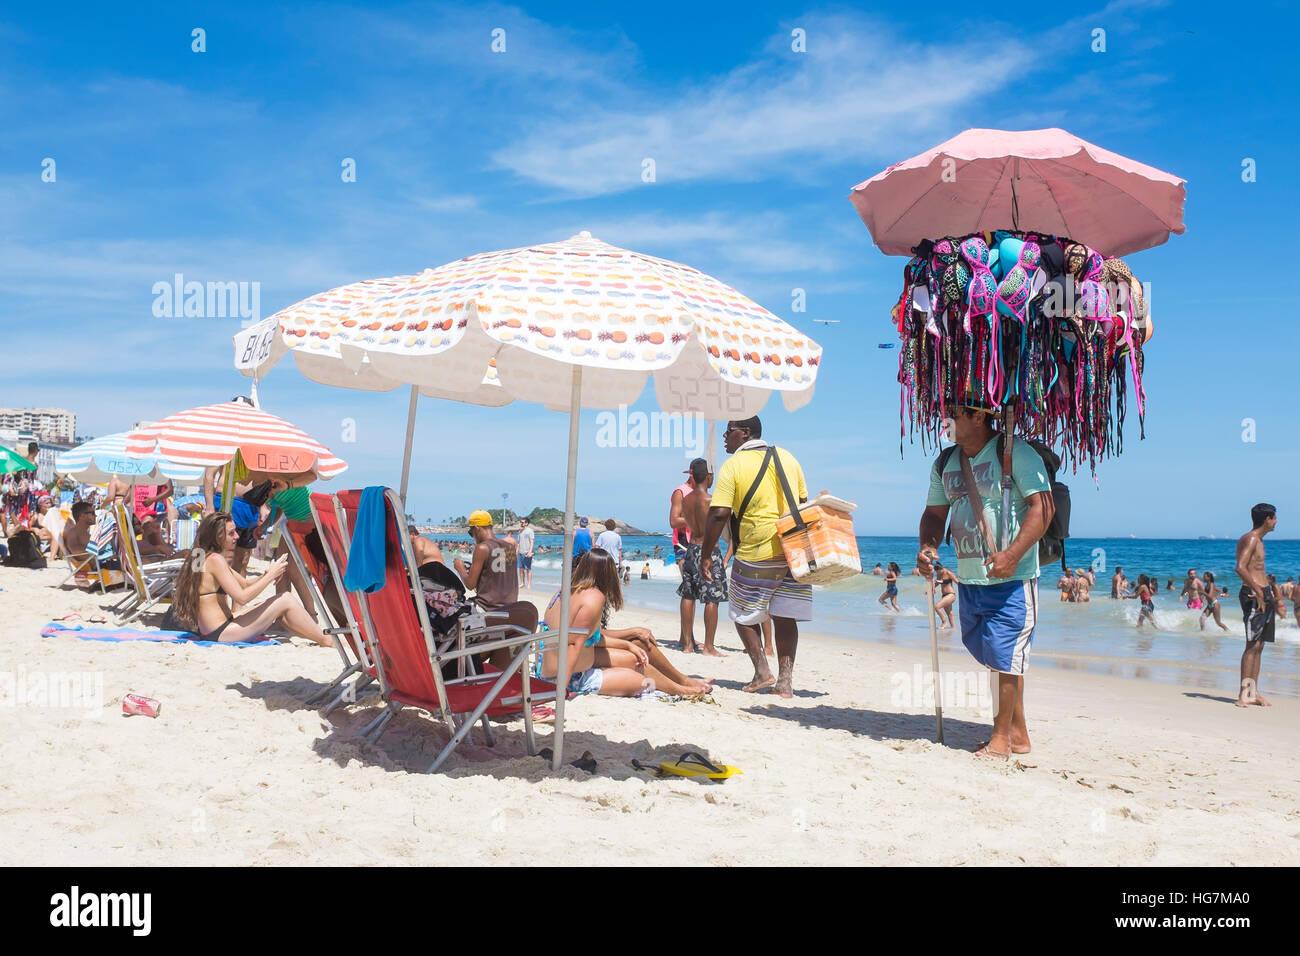 RIO DE JANEIRO - JANUARY 05, 2016: Beach vendors and sunbathers share a bright day on Ipanema Beach. - Stock Image